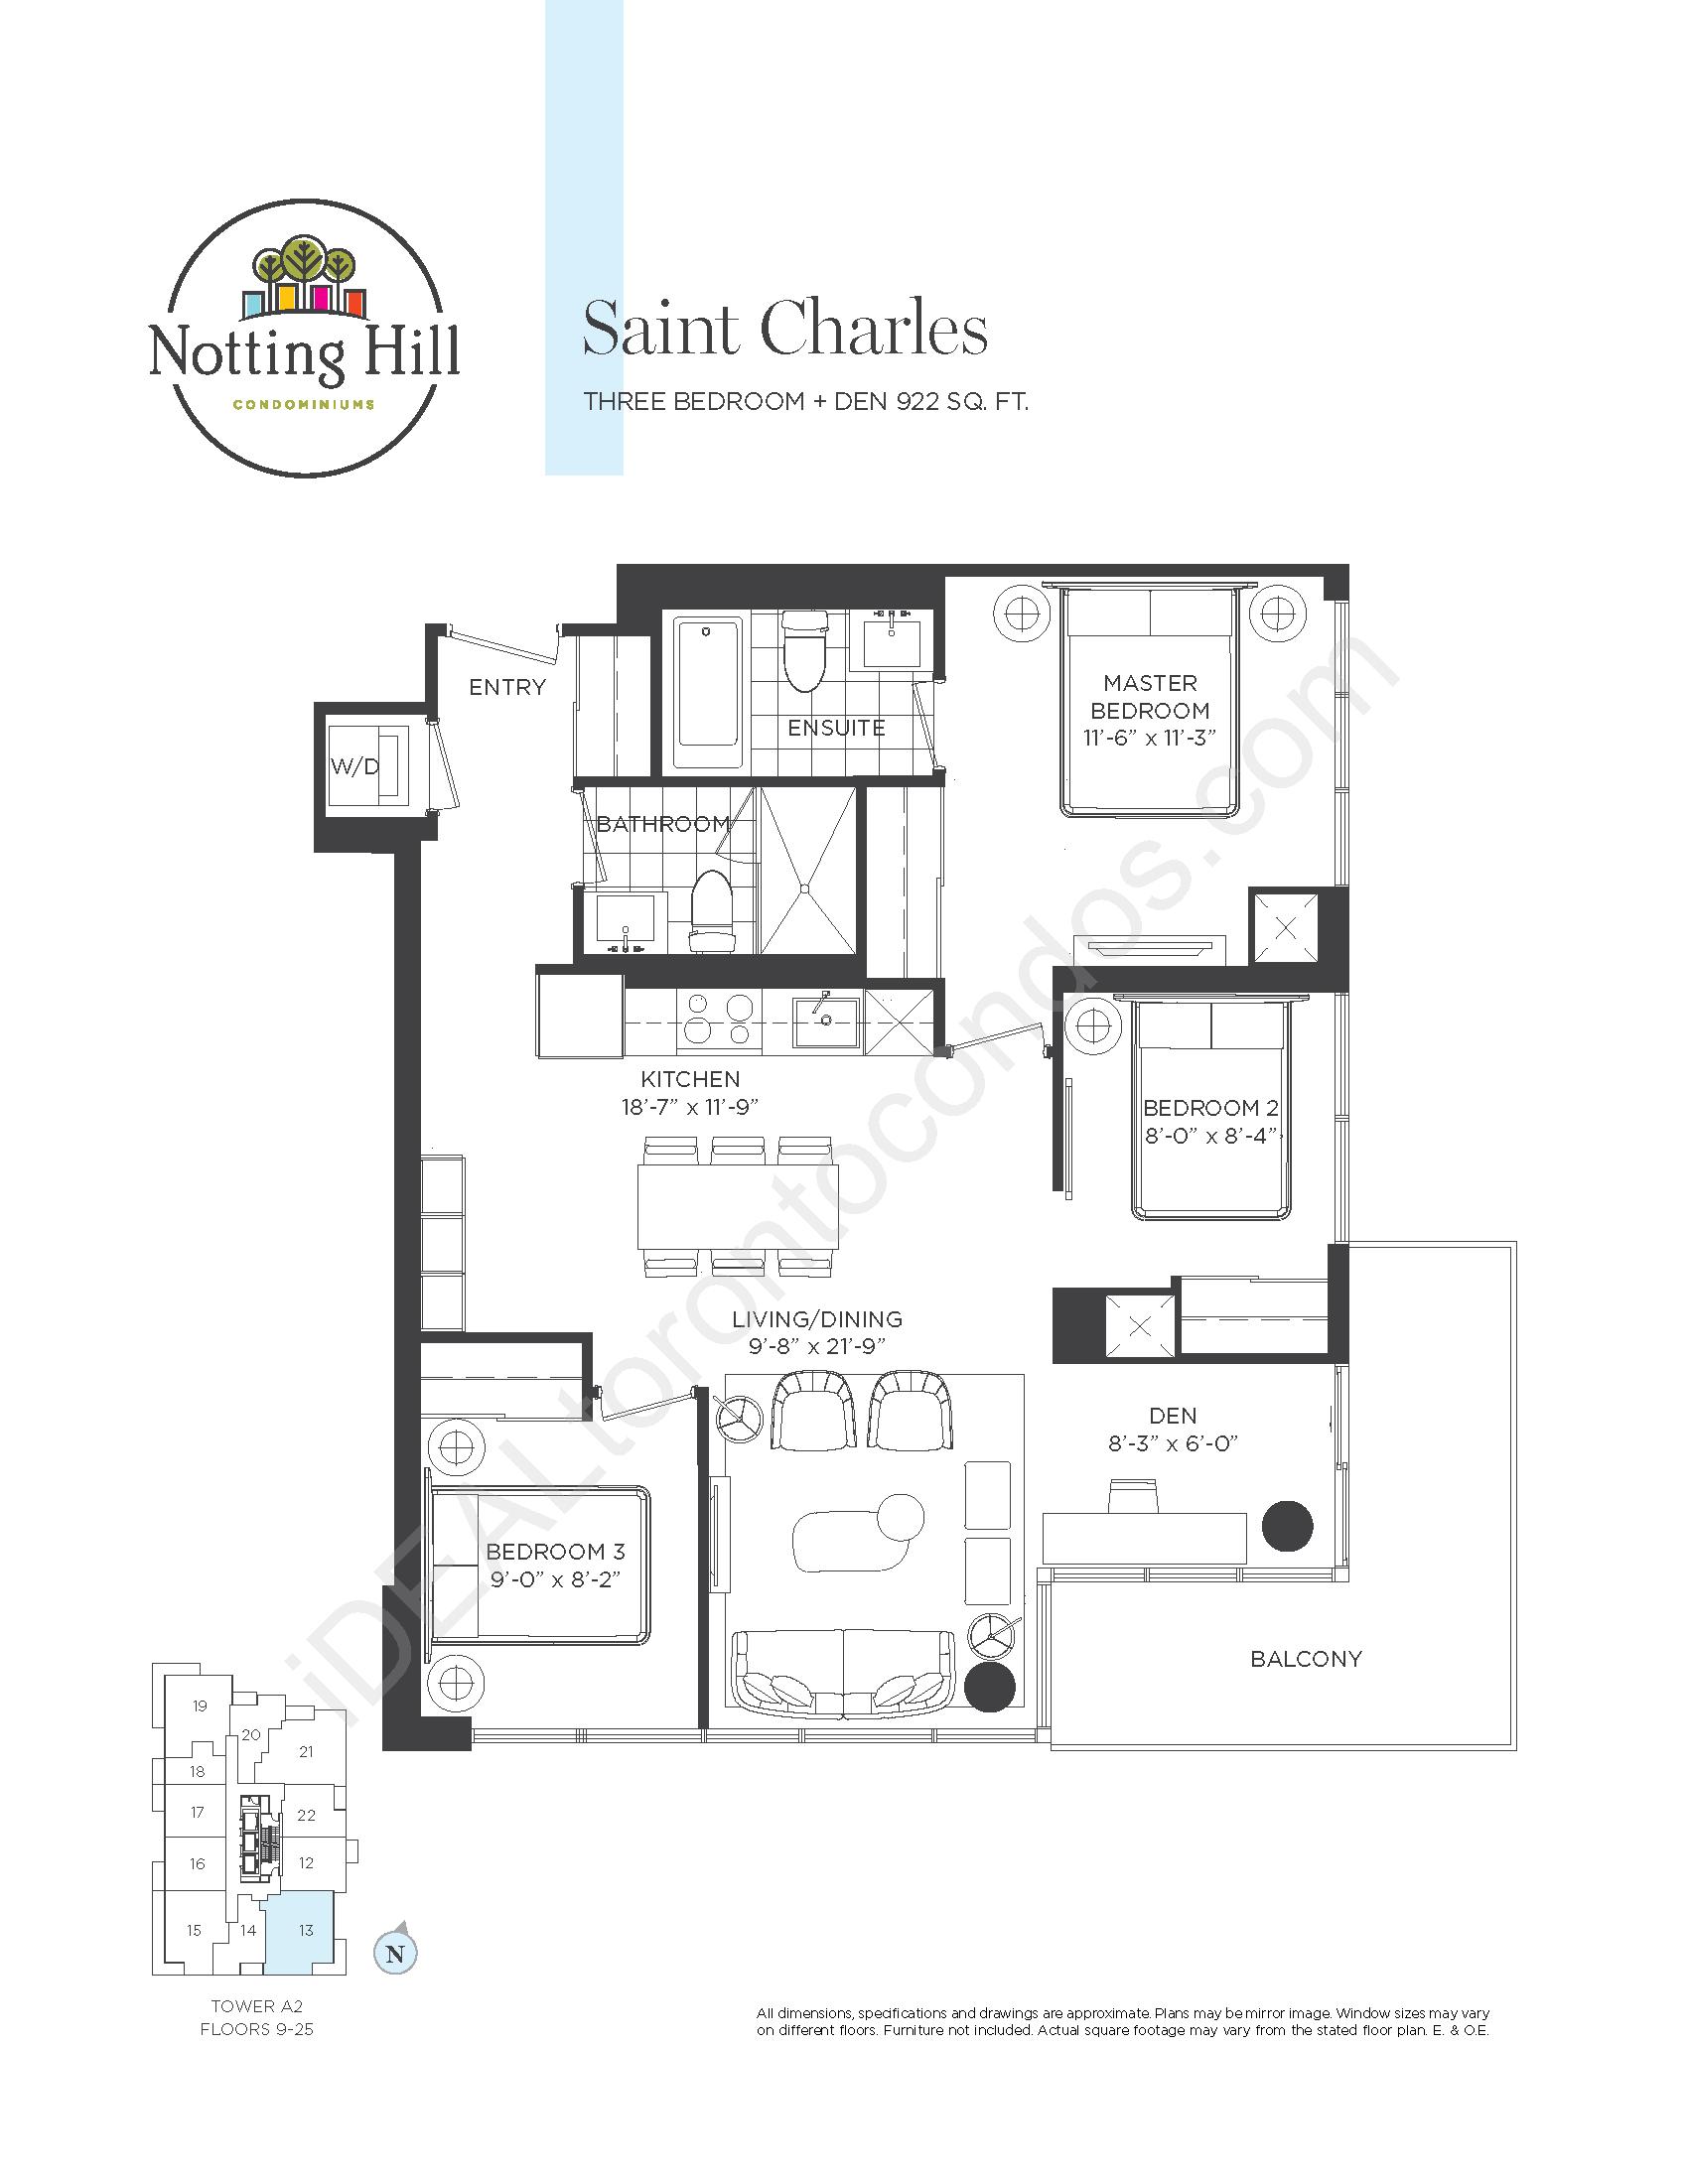 Saint Charles - Three Bedroom + den